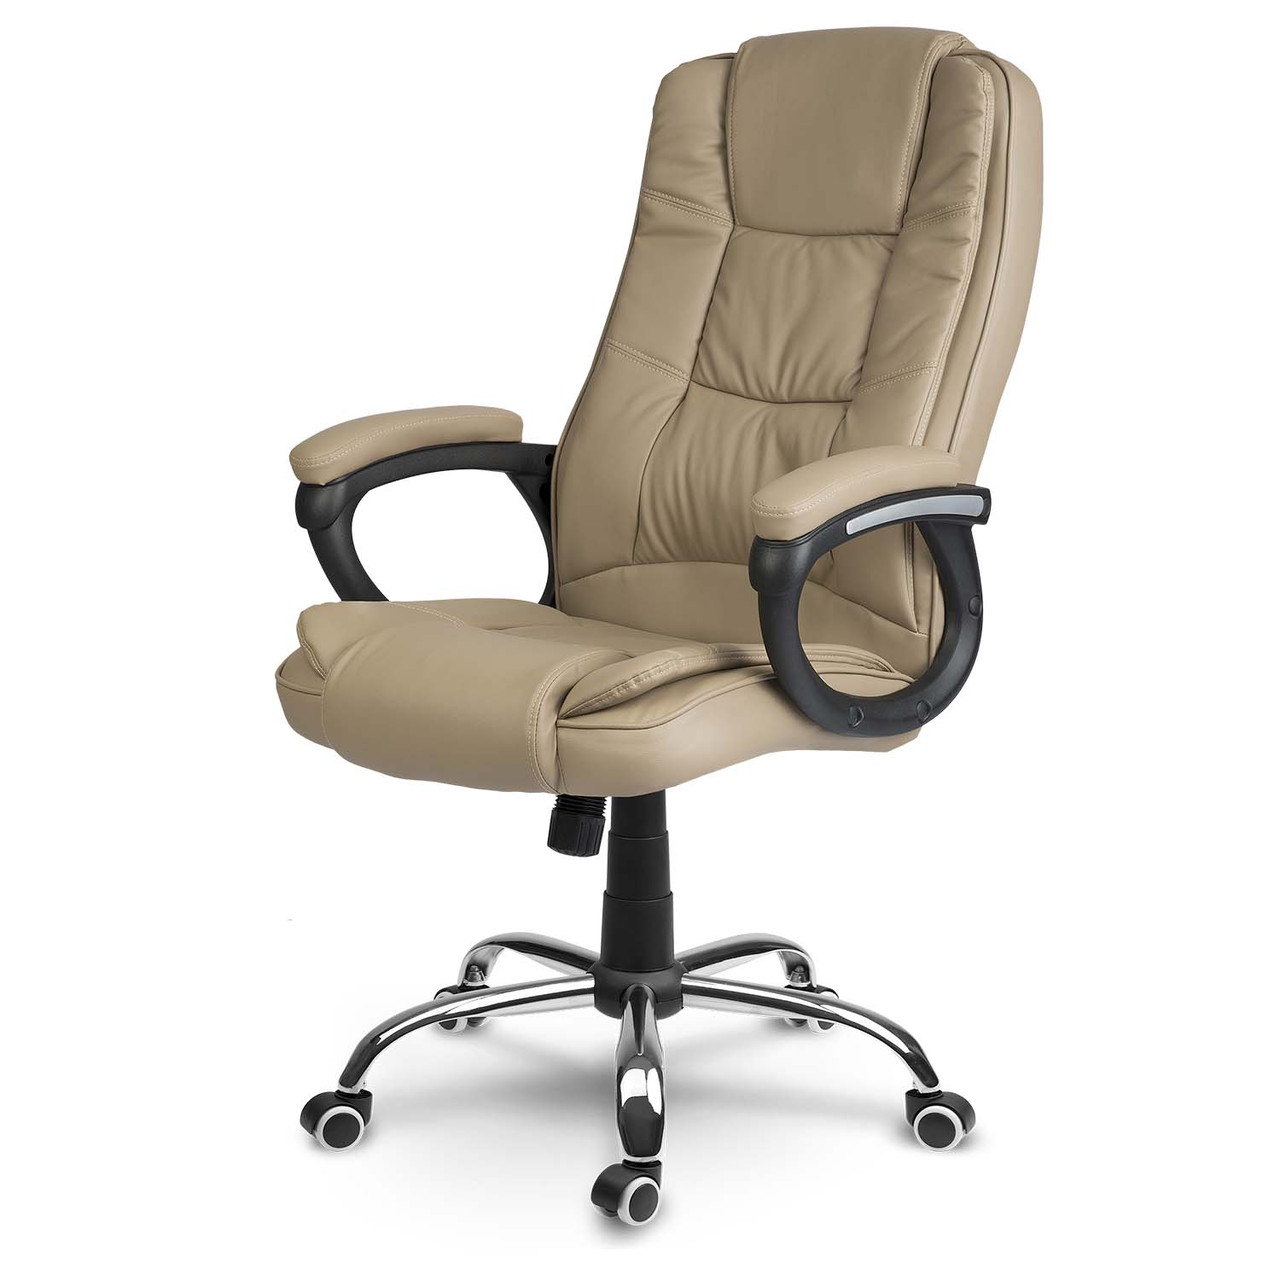 Офисное кресло Sofotel Porto бежевое